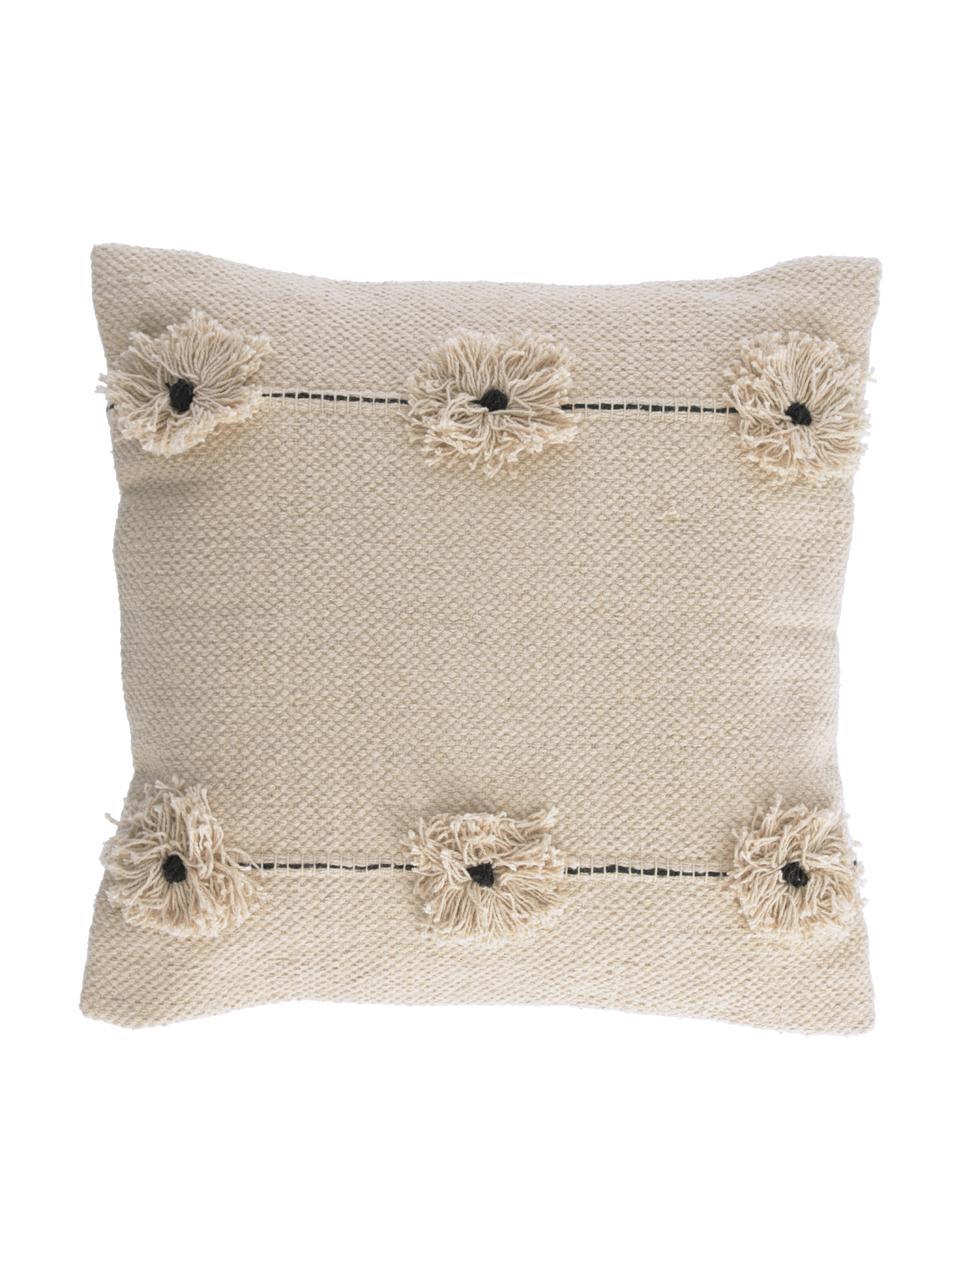 Federa arredo con fiori decorativi Belisa, 100% cotone, Beige, Larg. 45 x Lung. 45 cm